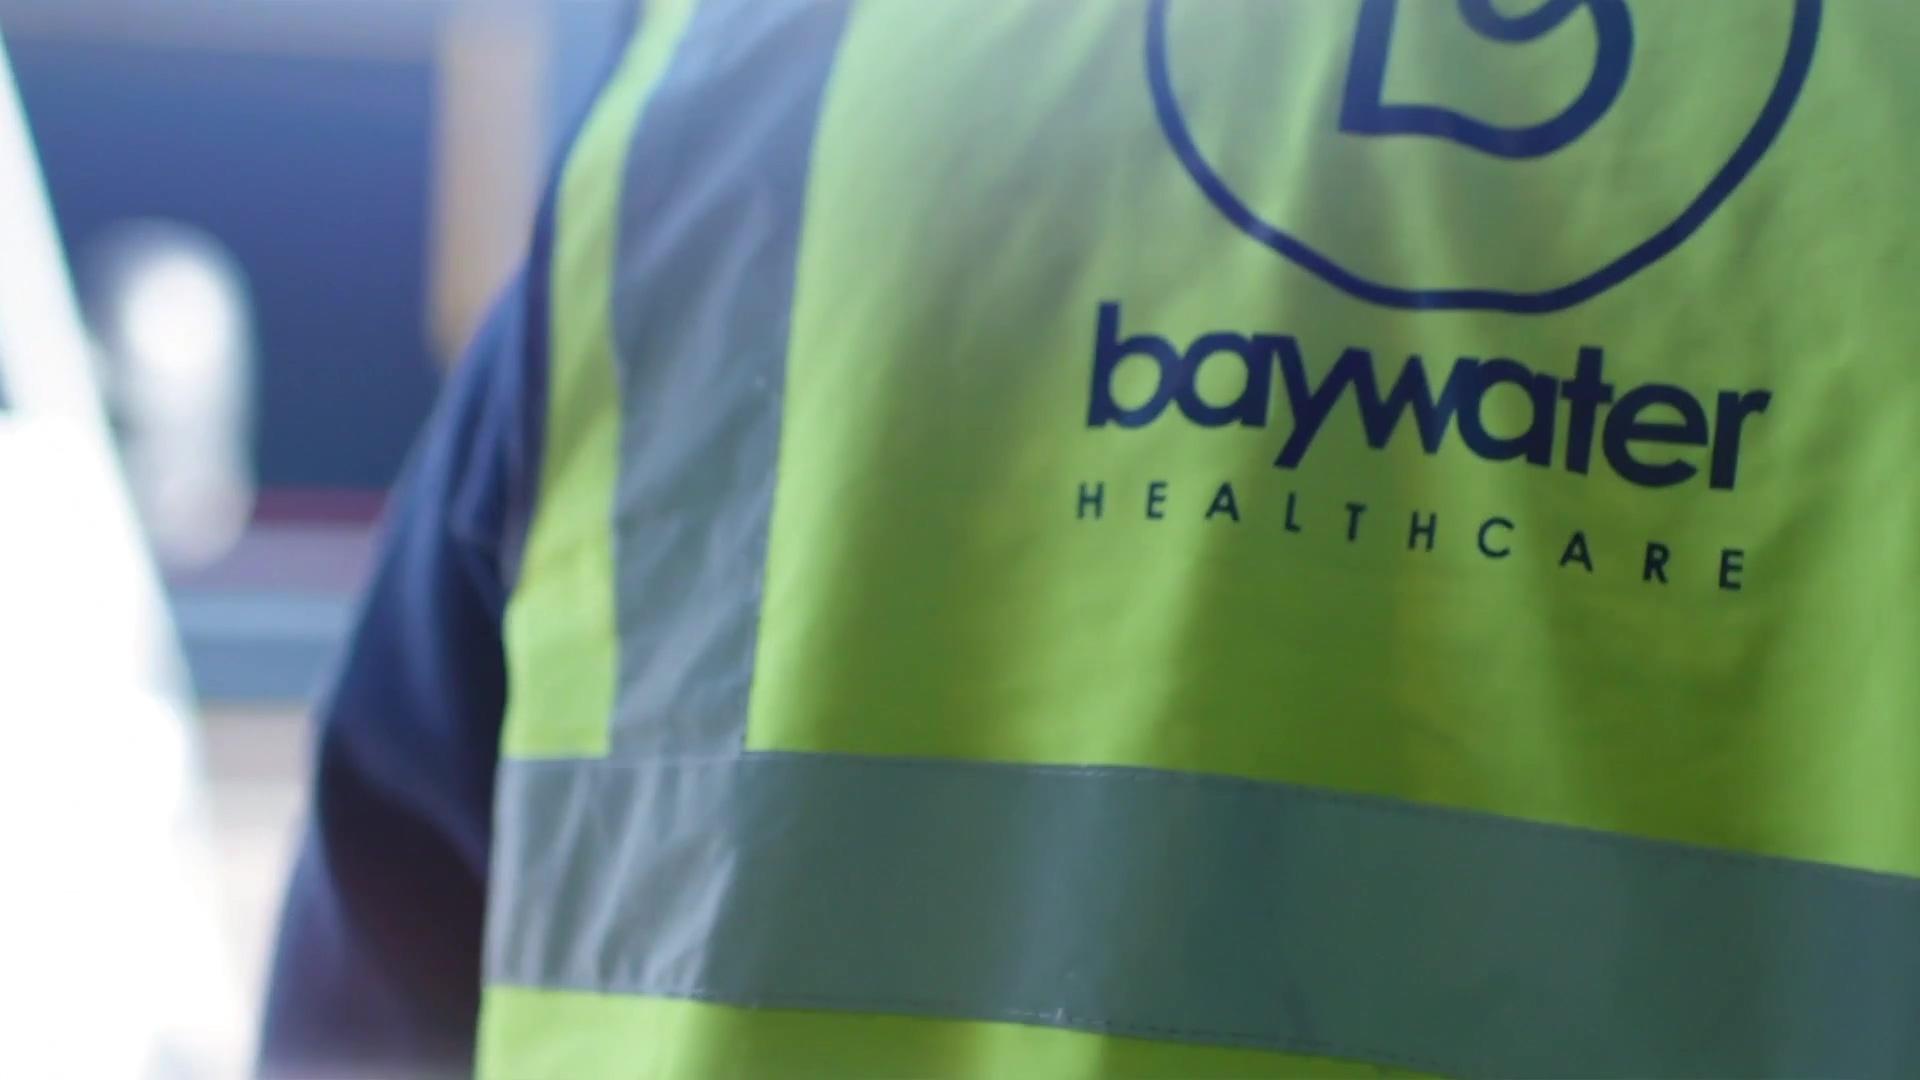 Marketing Matters - Baywater Healthcare_SA